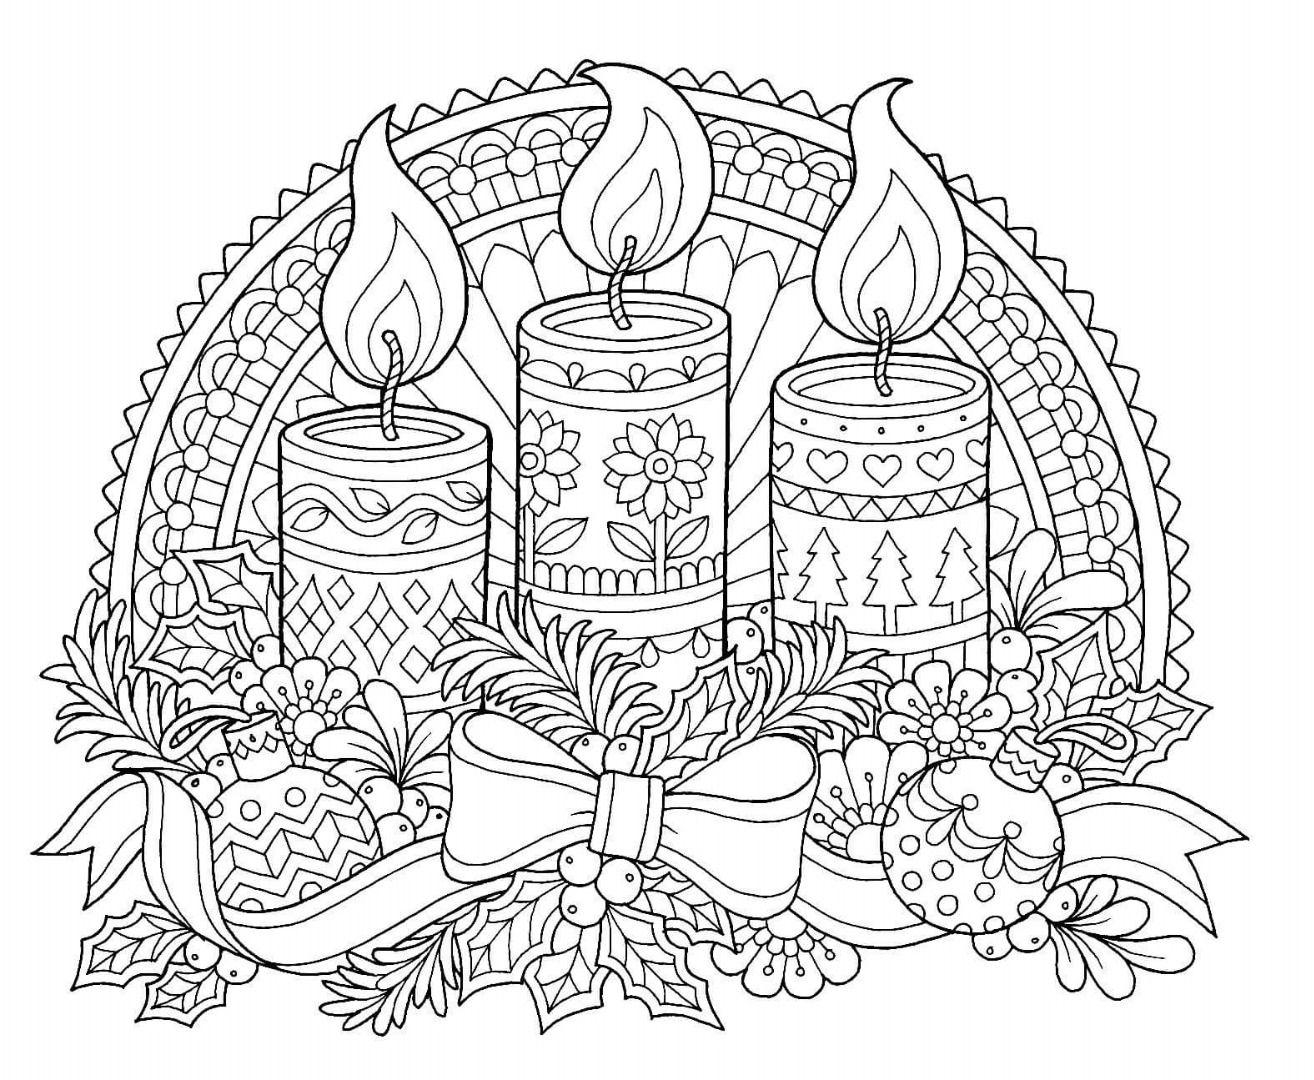 Christmas Drawing 5 Christmas Coloring Sheets Free Christmas Coloring Pages Printable Christmas Coloring Pages